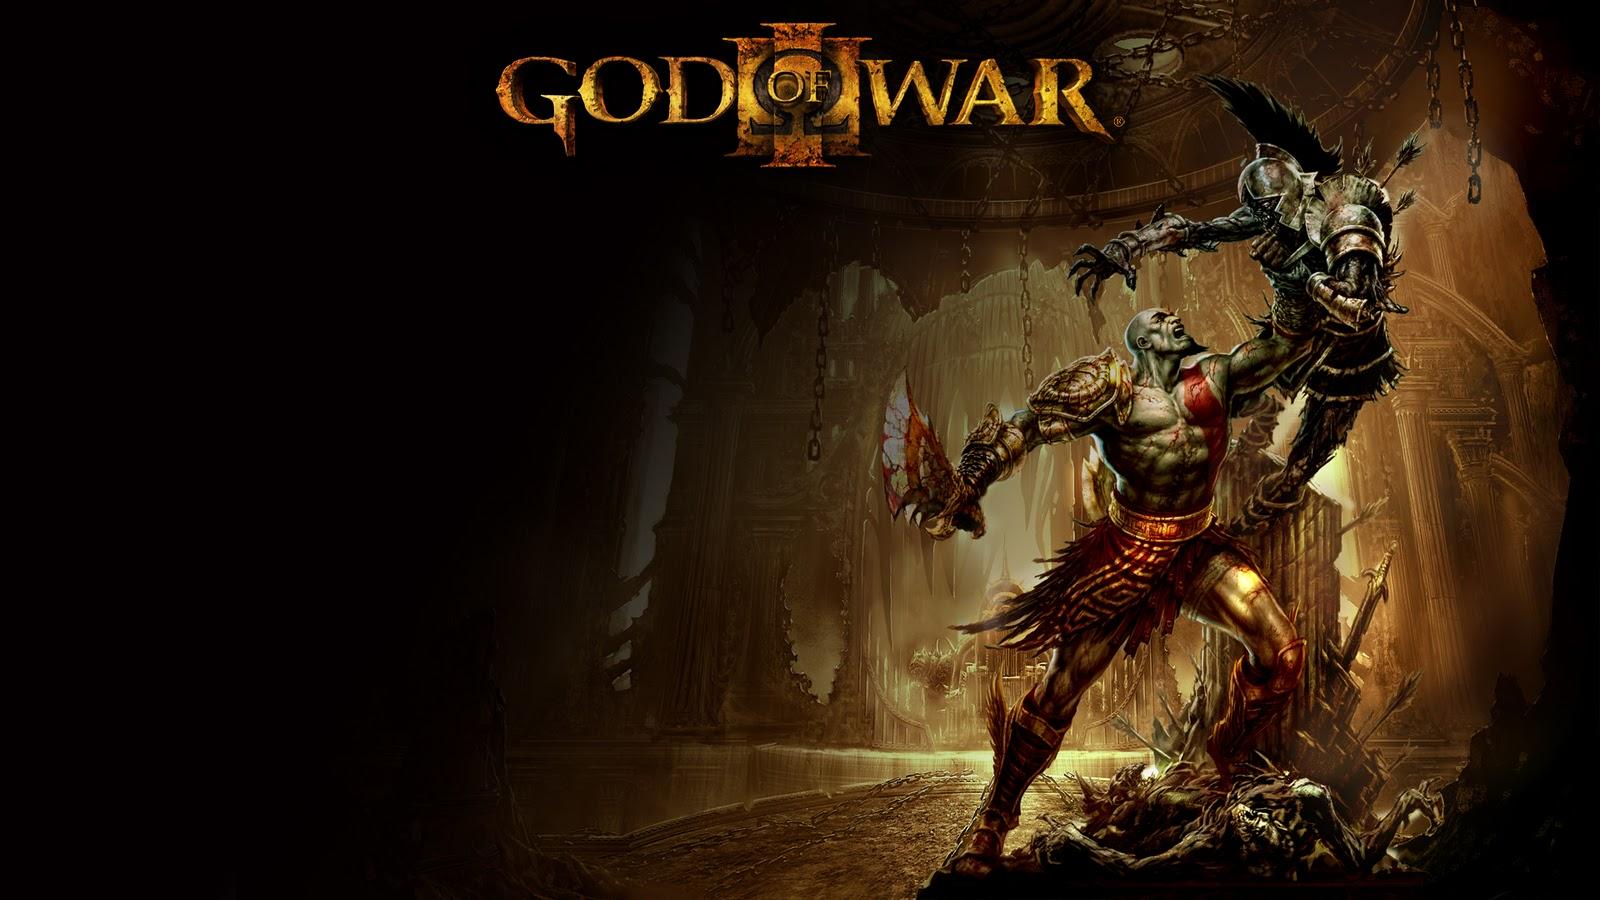 http://2.bp.blogspot.com/_-i7lJ5kj8Uw/TRIk10oFjCI/AAAAAAAAADI/oP0eCx_PlxU/s1600/god-of-war-iii-survey-wallpaper-hd+%25281%2529.jpg